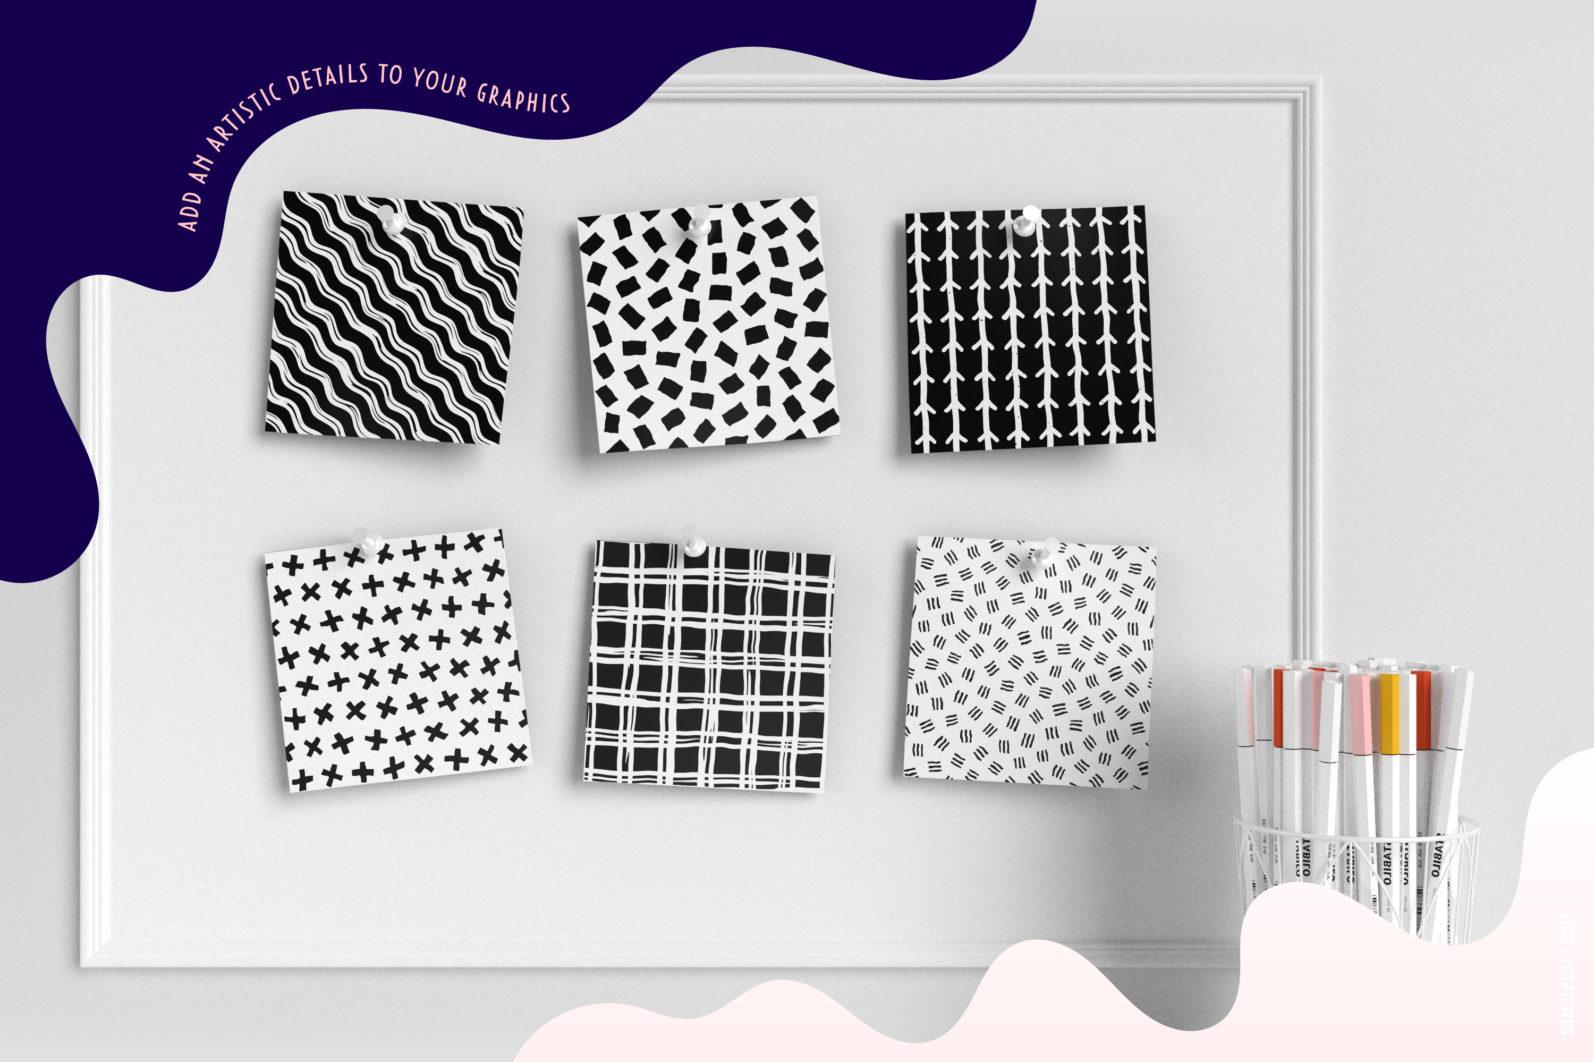 Handmade patterns bundle - 300 seamless patterns, brushes, and shapes - Samolevsky.com Handmade patterns bundle 12 scaled -